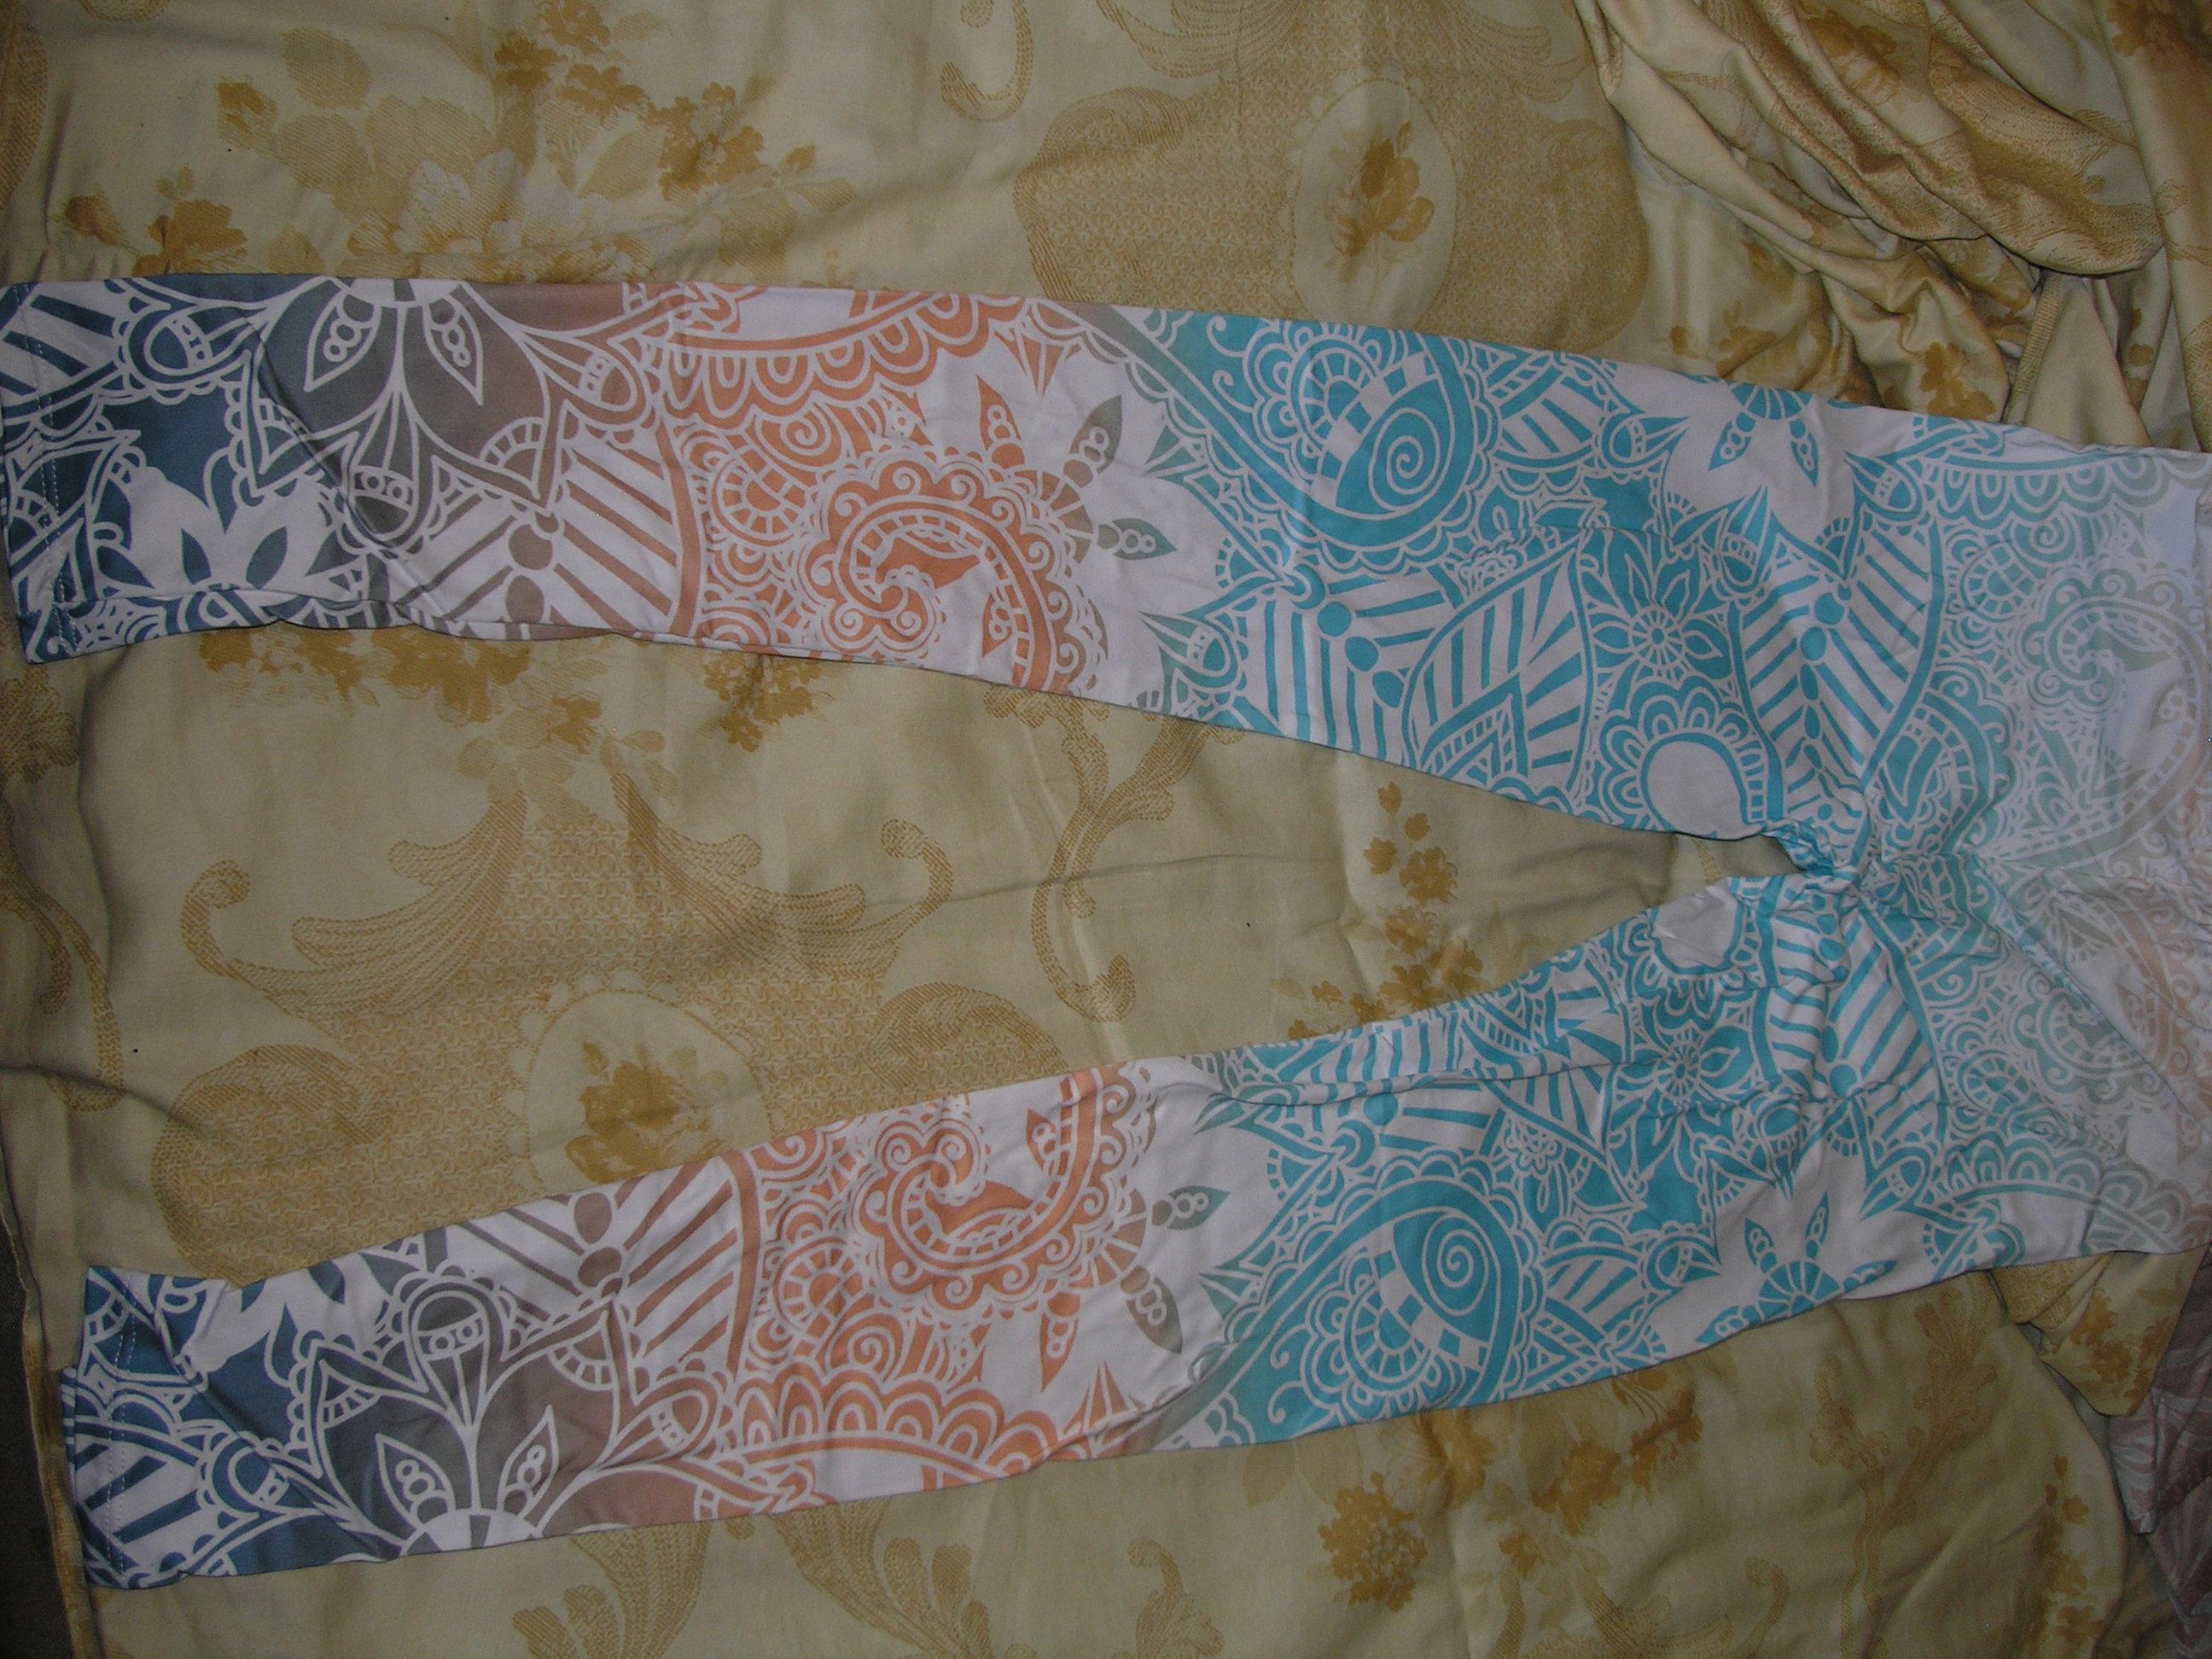 Zohra Brand Hot Sales Leggings Mandala Mint Print Fitness legging High Elasticity Leggins Legins Trouser Pants for women